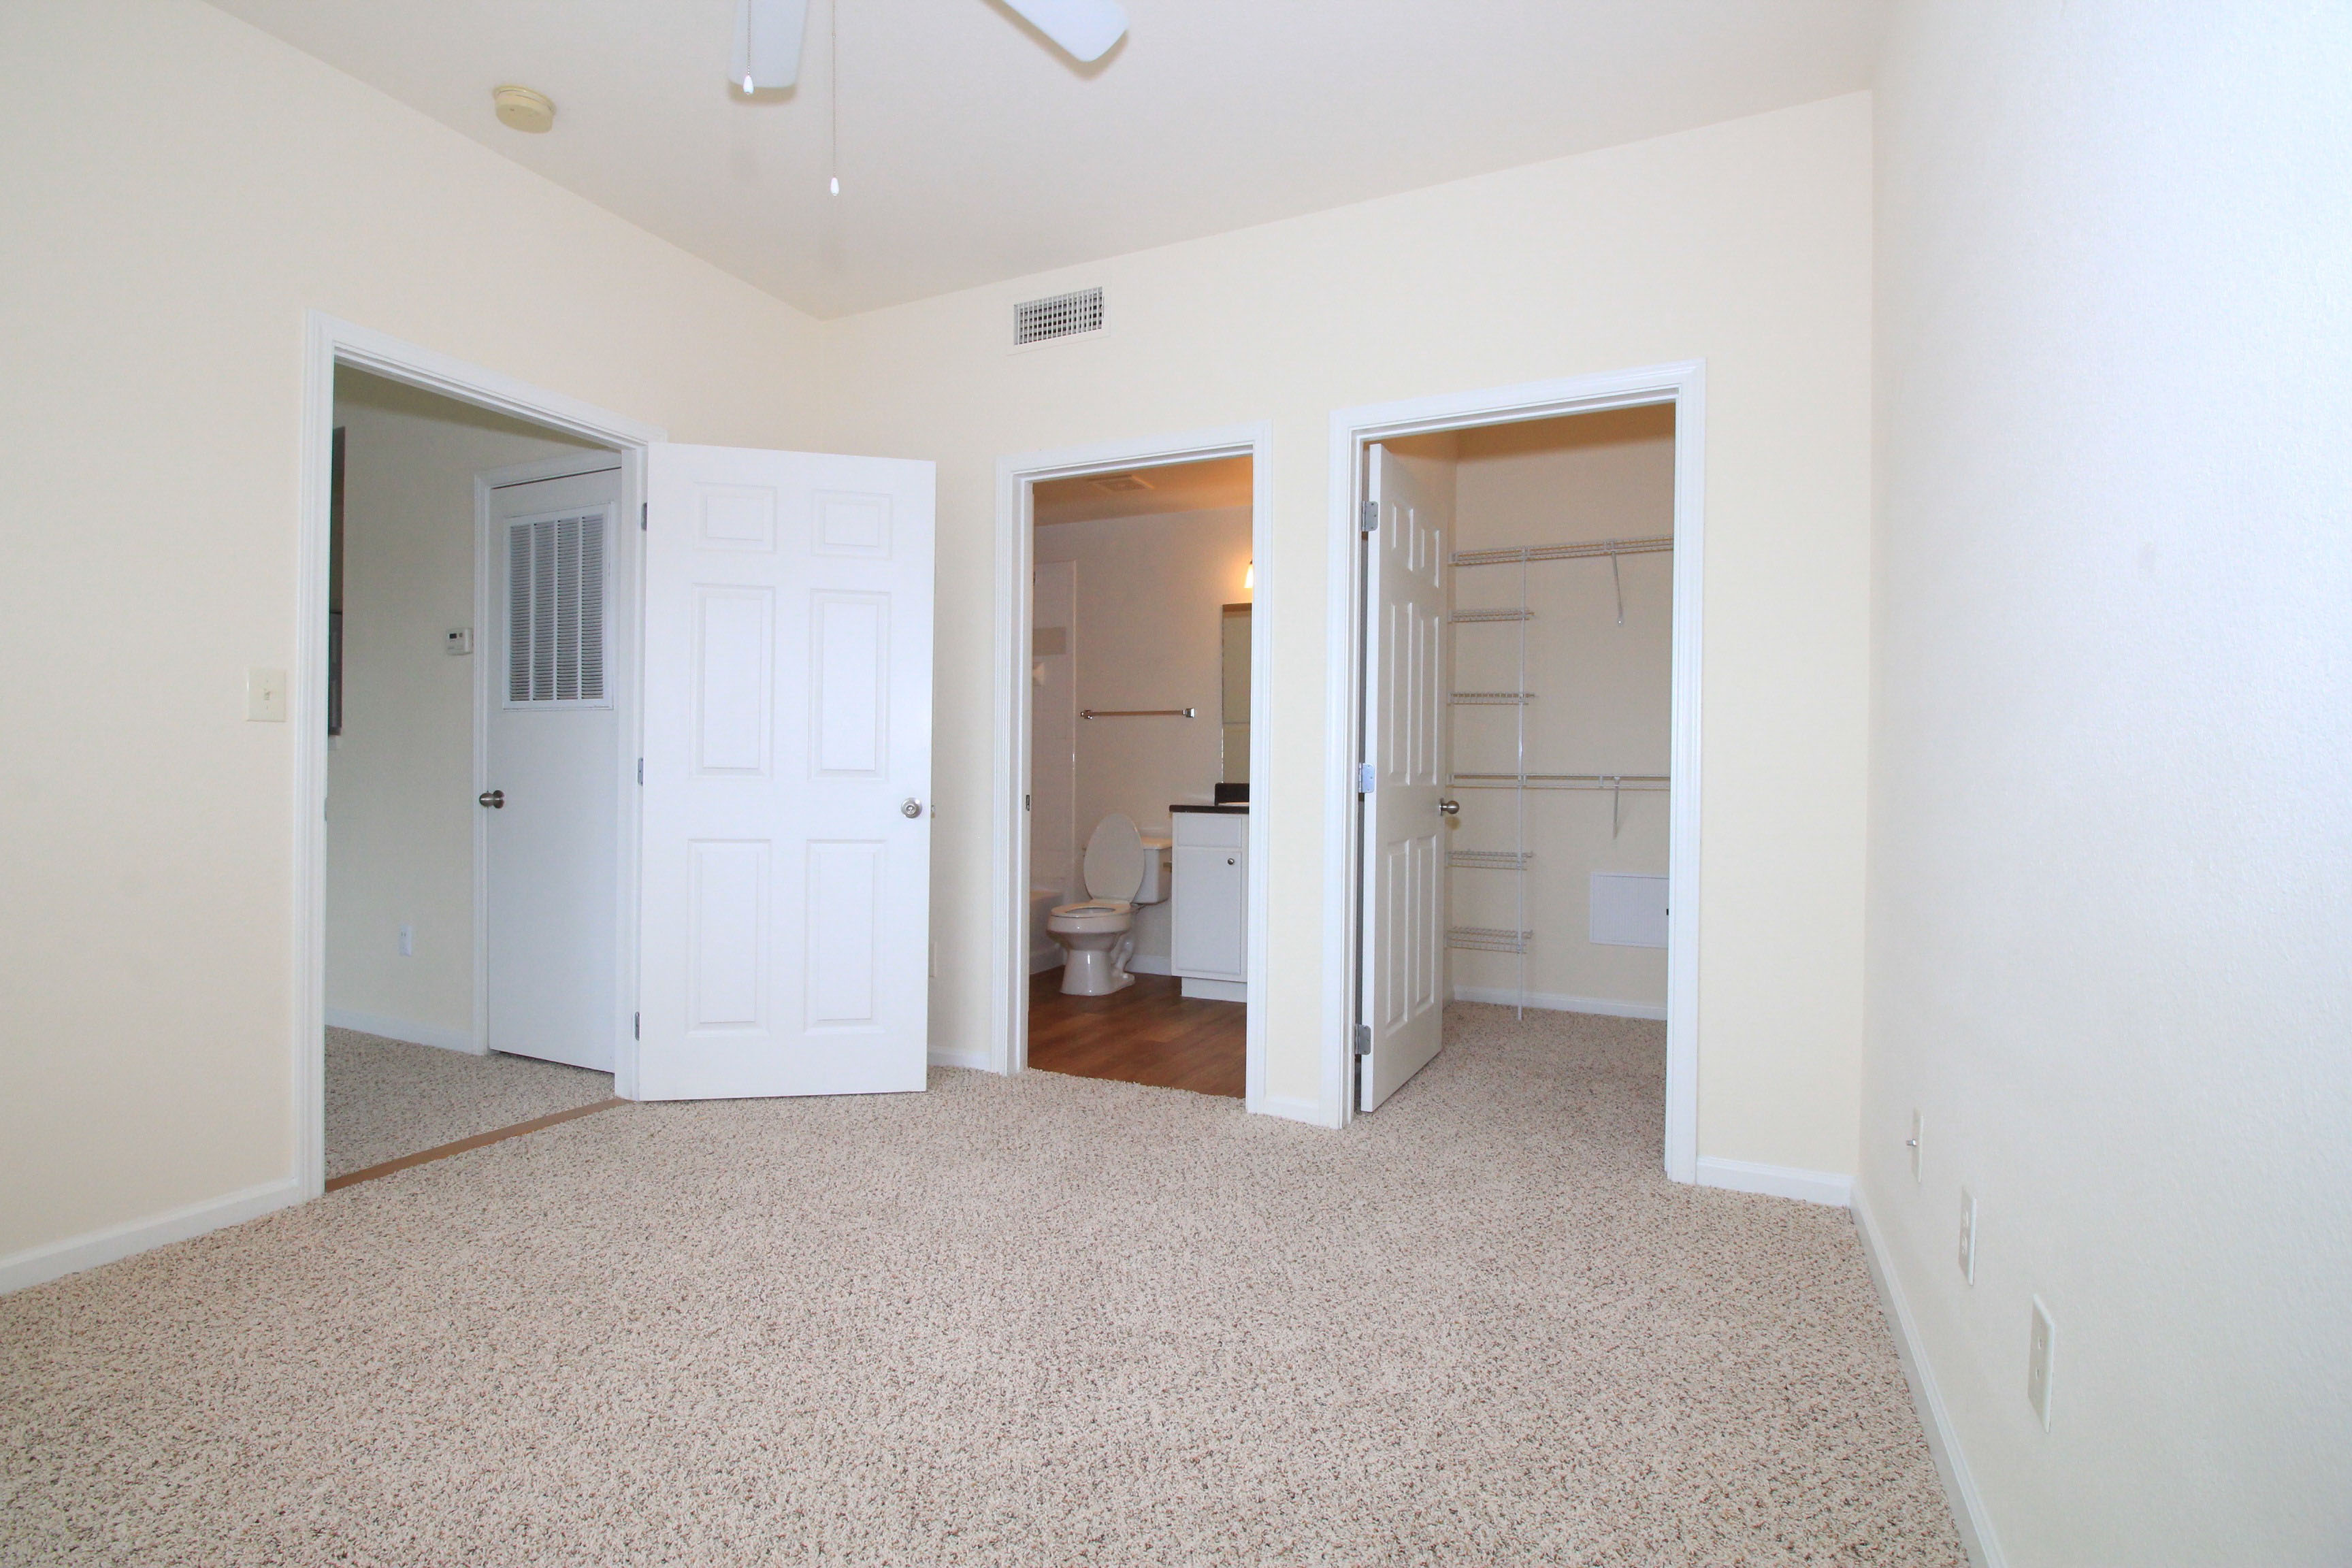 Walk In Closet and Bathroom at The Oxford at Estonia Apartments in San Antonio, TX